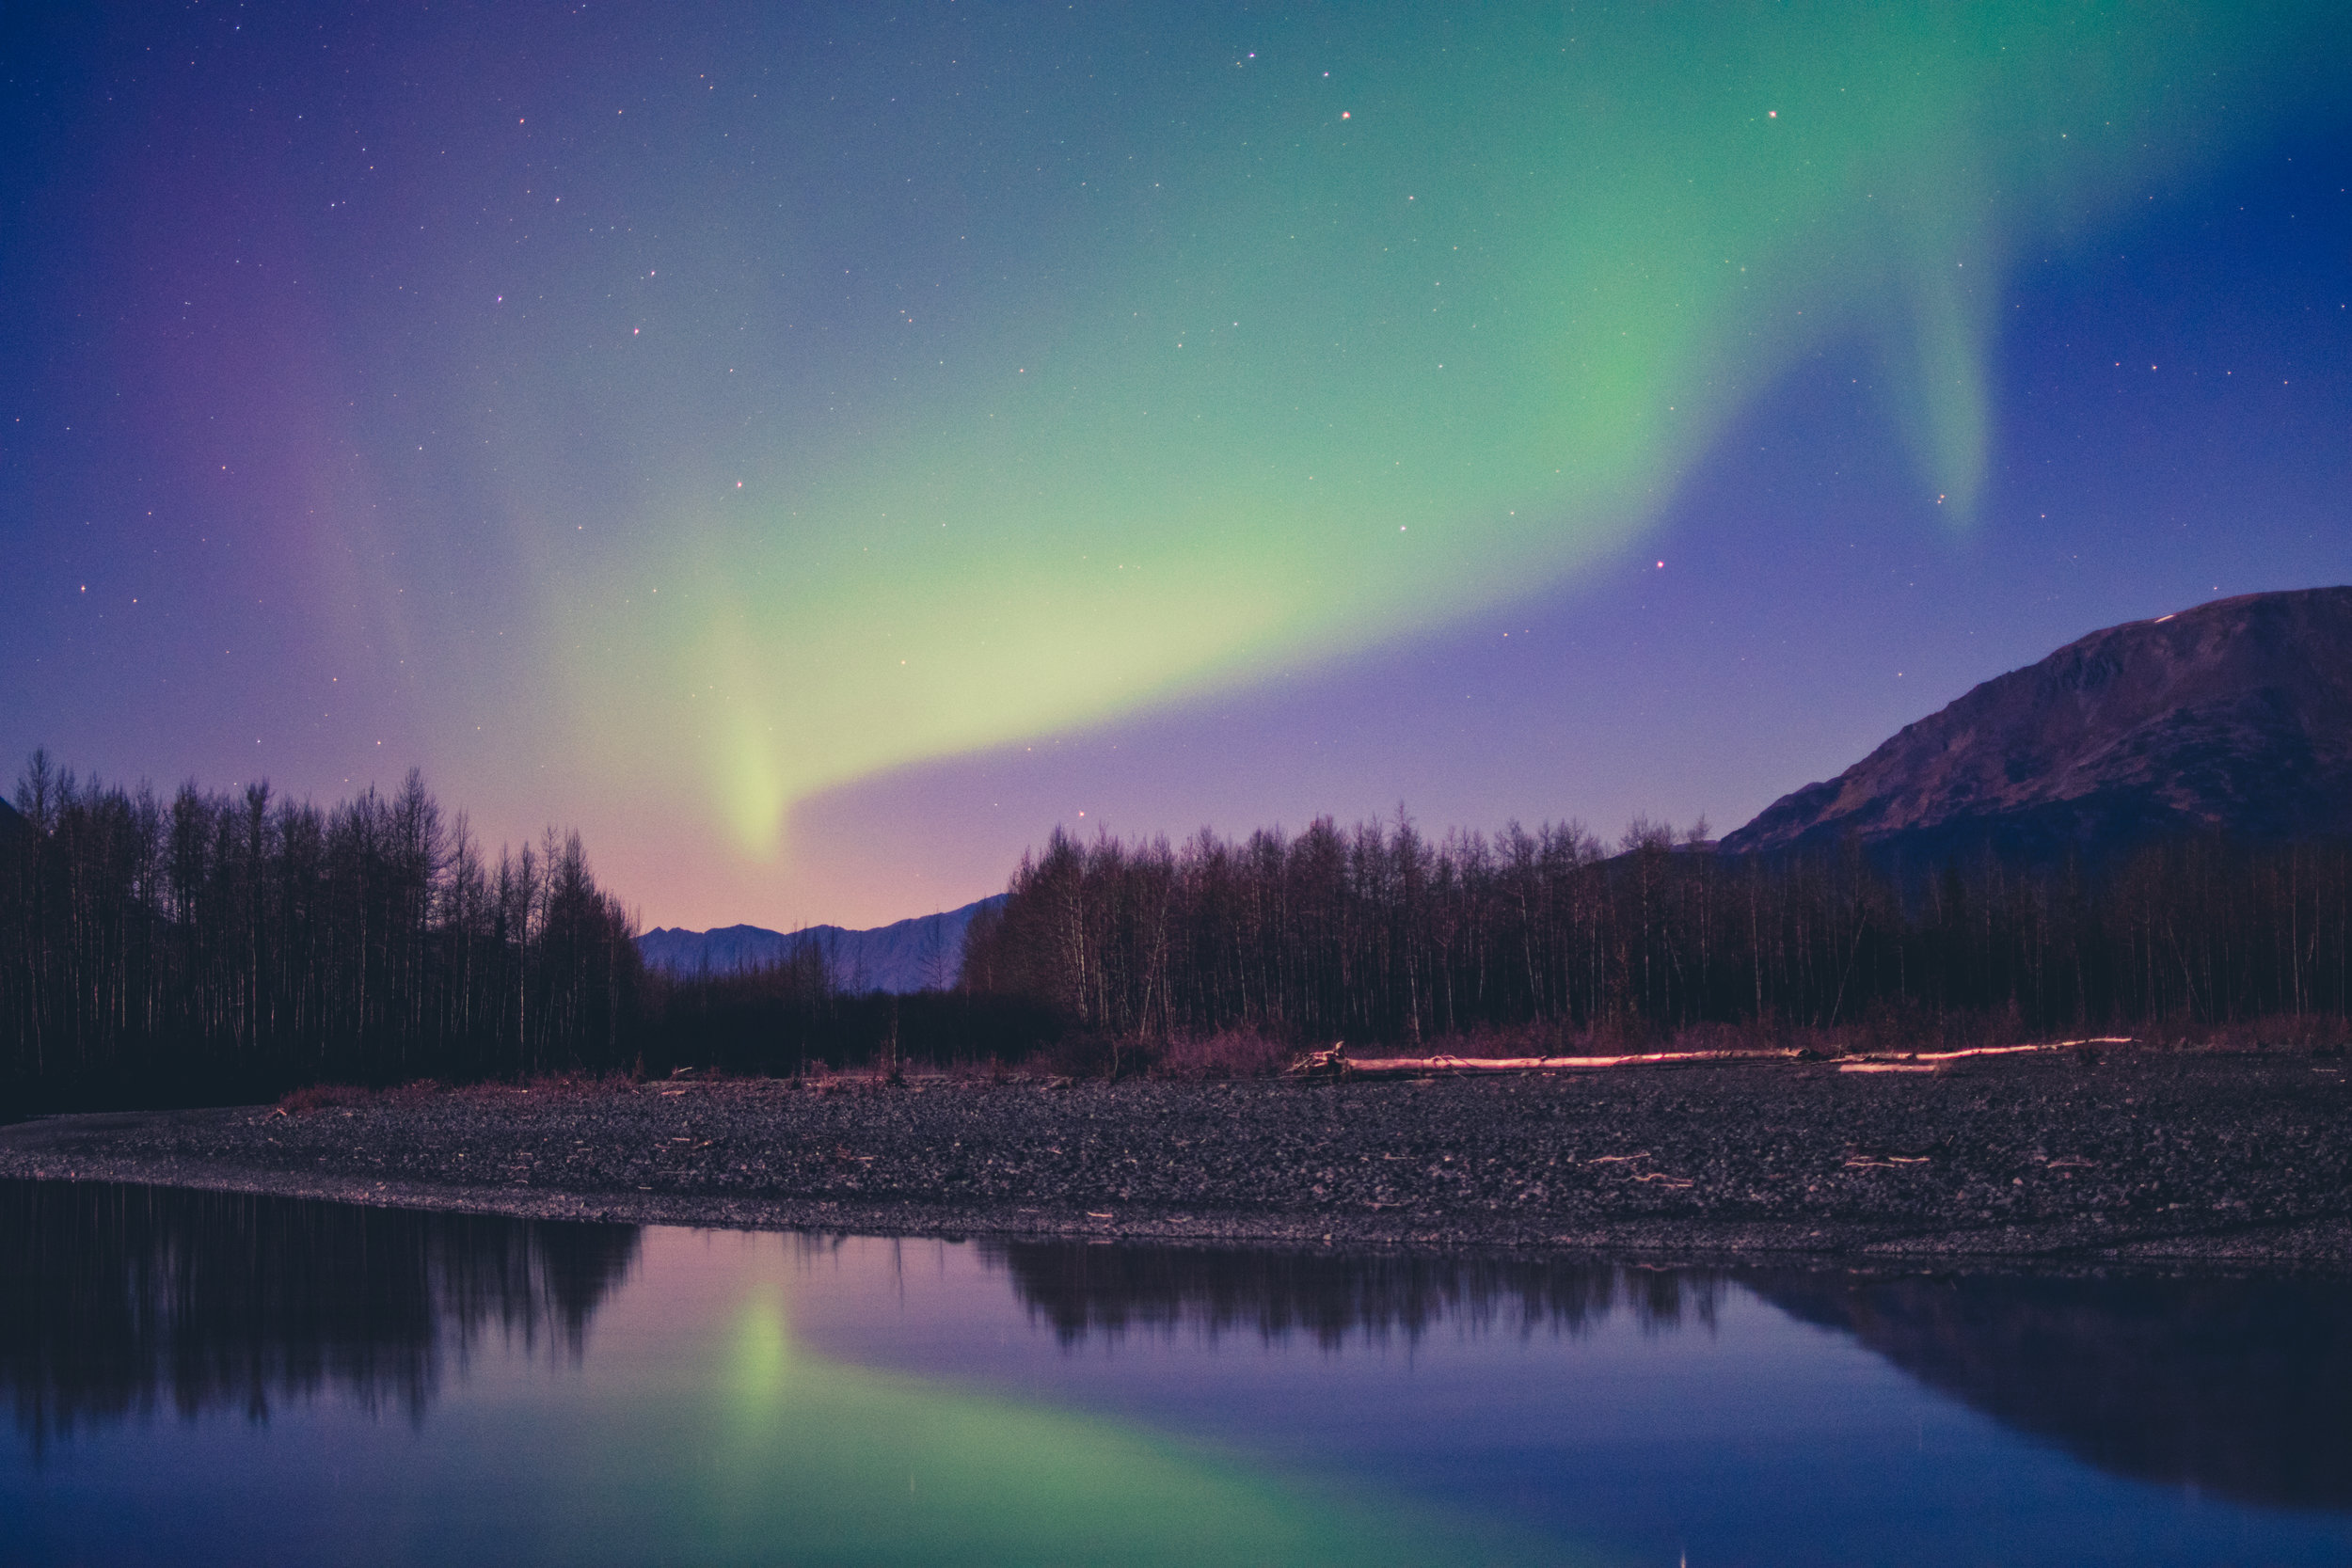 NORTHWEST - States Represented: Alaska, Idaho, Montana, Nebraska, North Dakota, Oregon, South Dakota, Washington, Wyoming